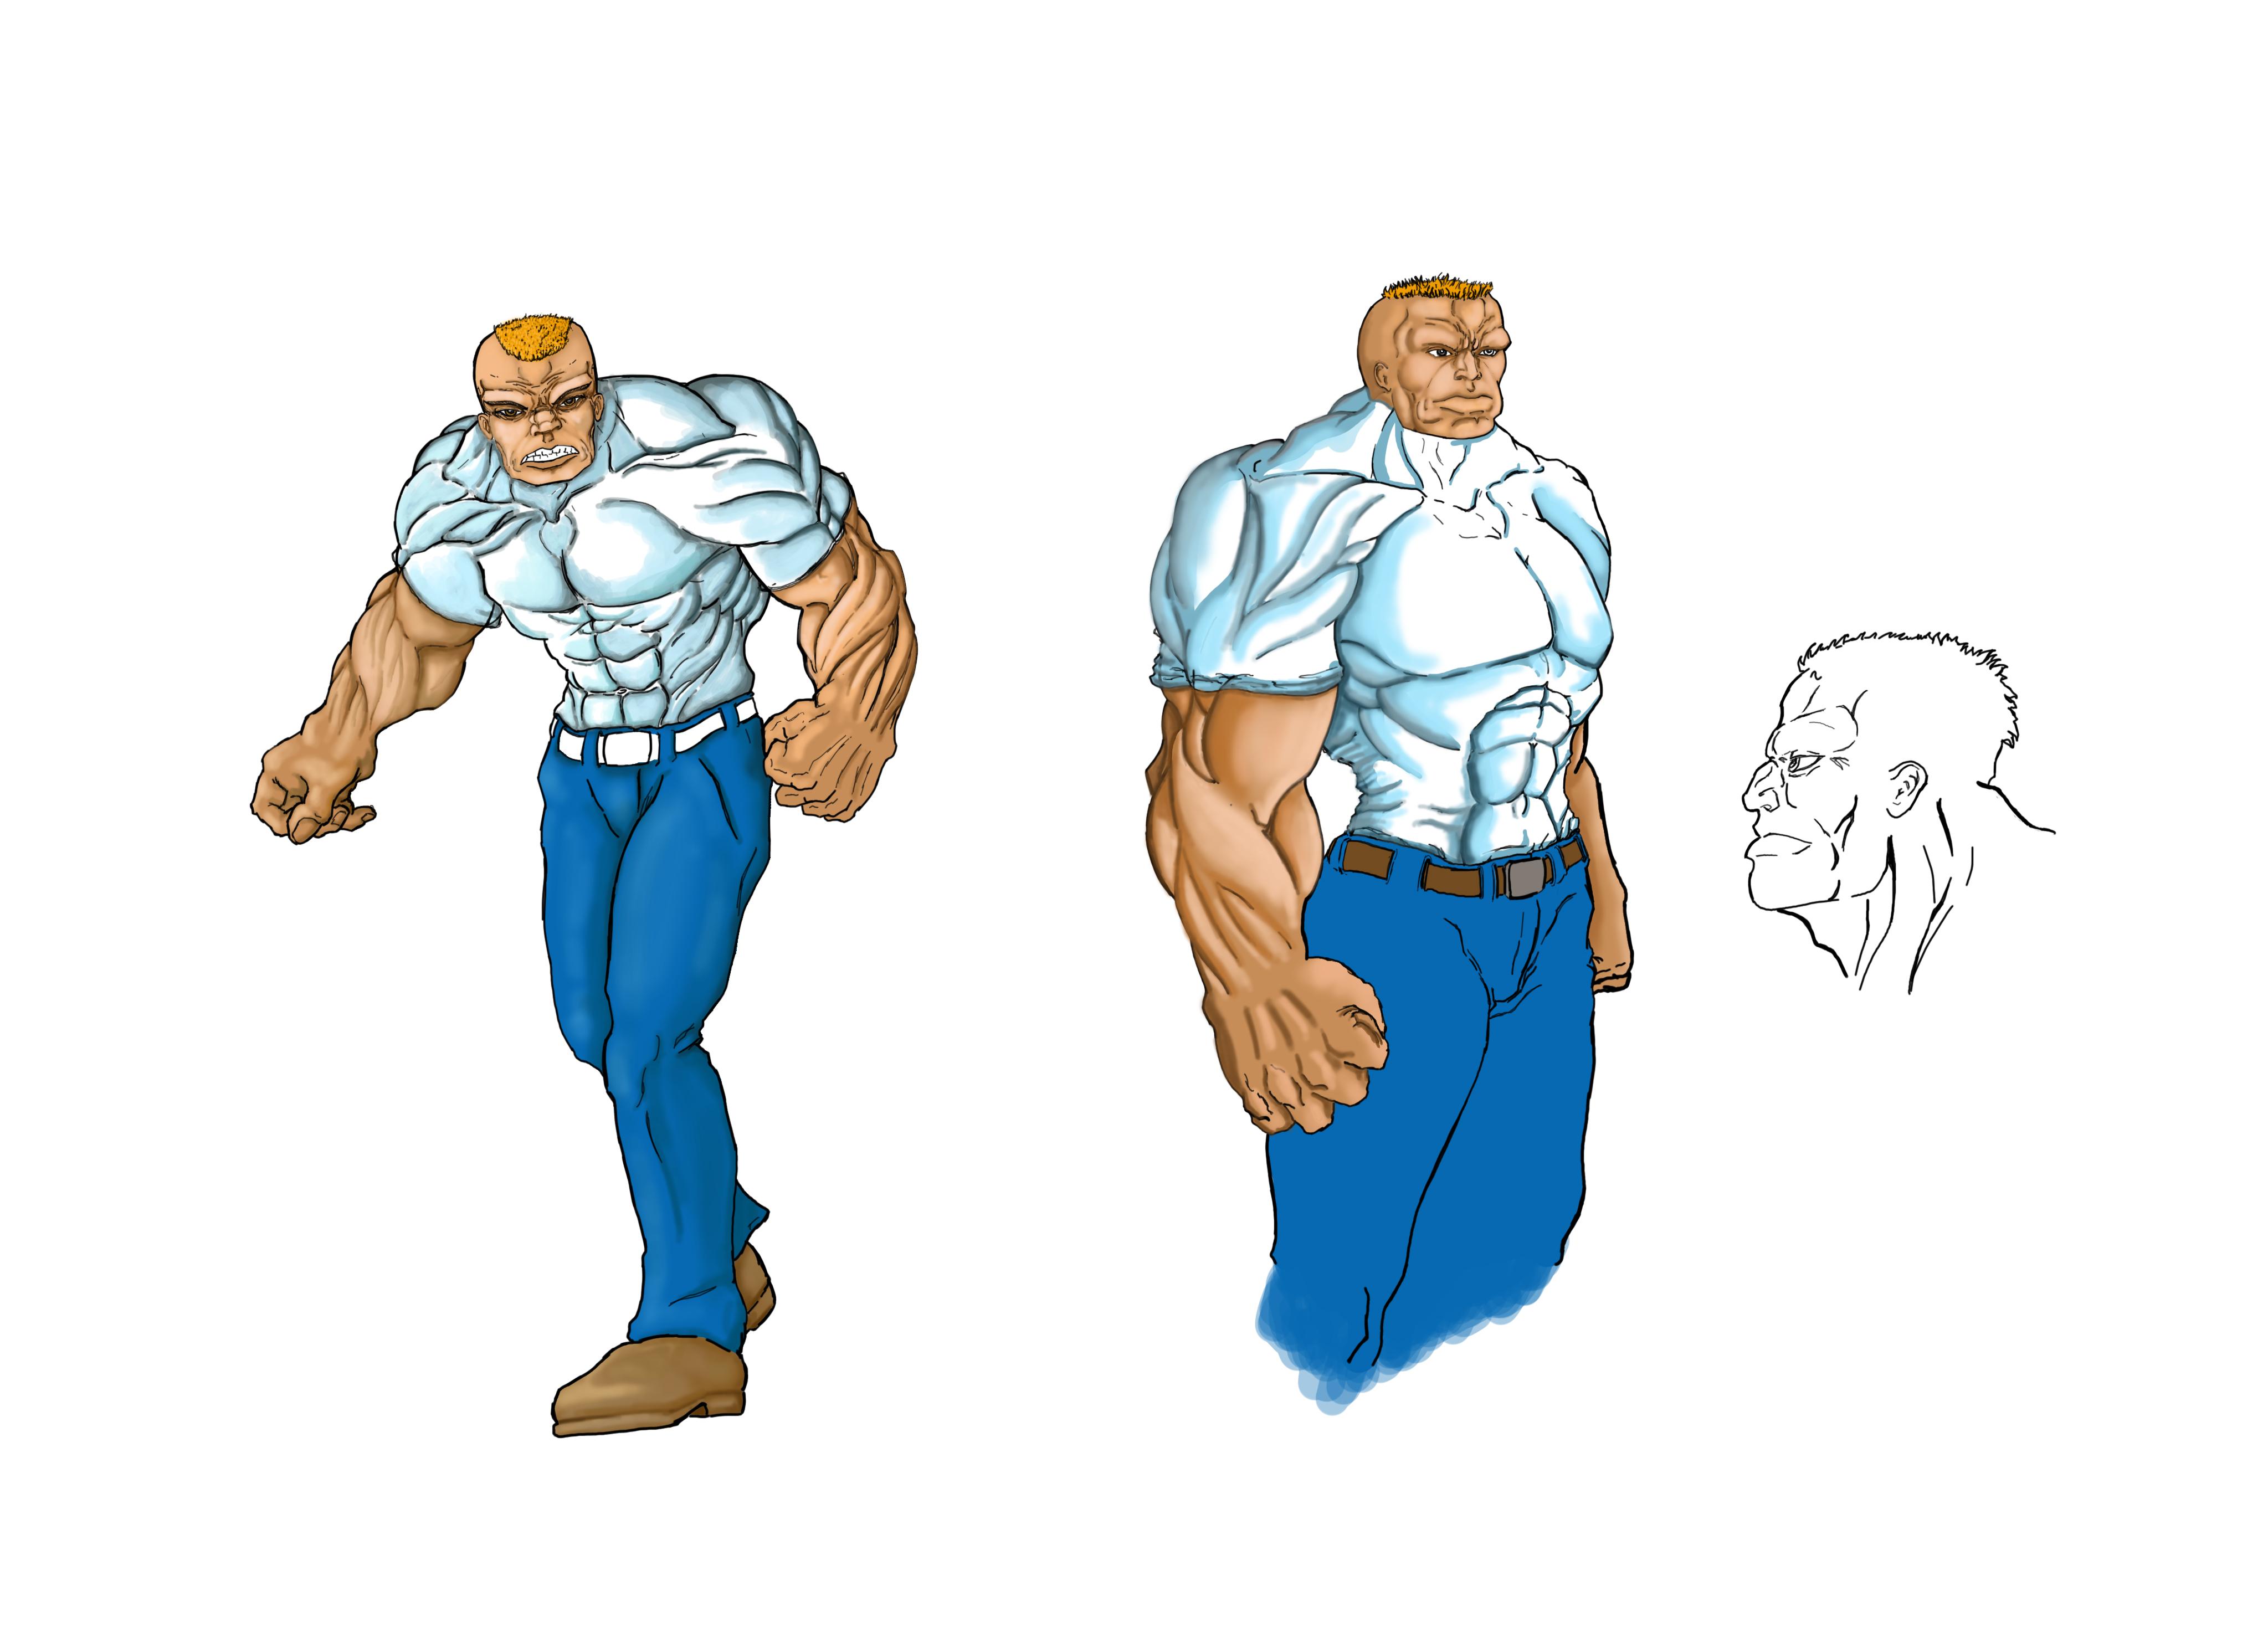 bruno+Character+designcolod